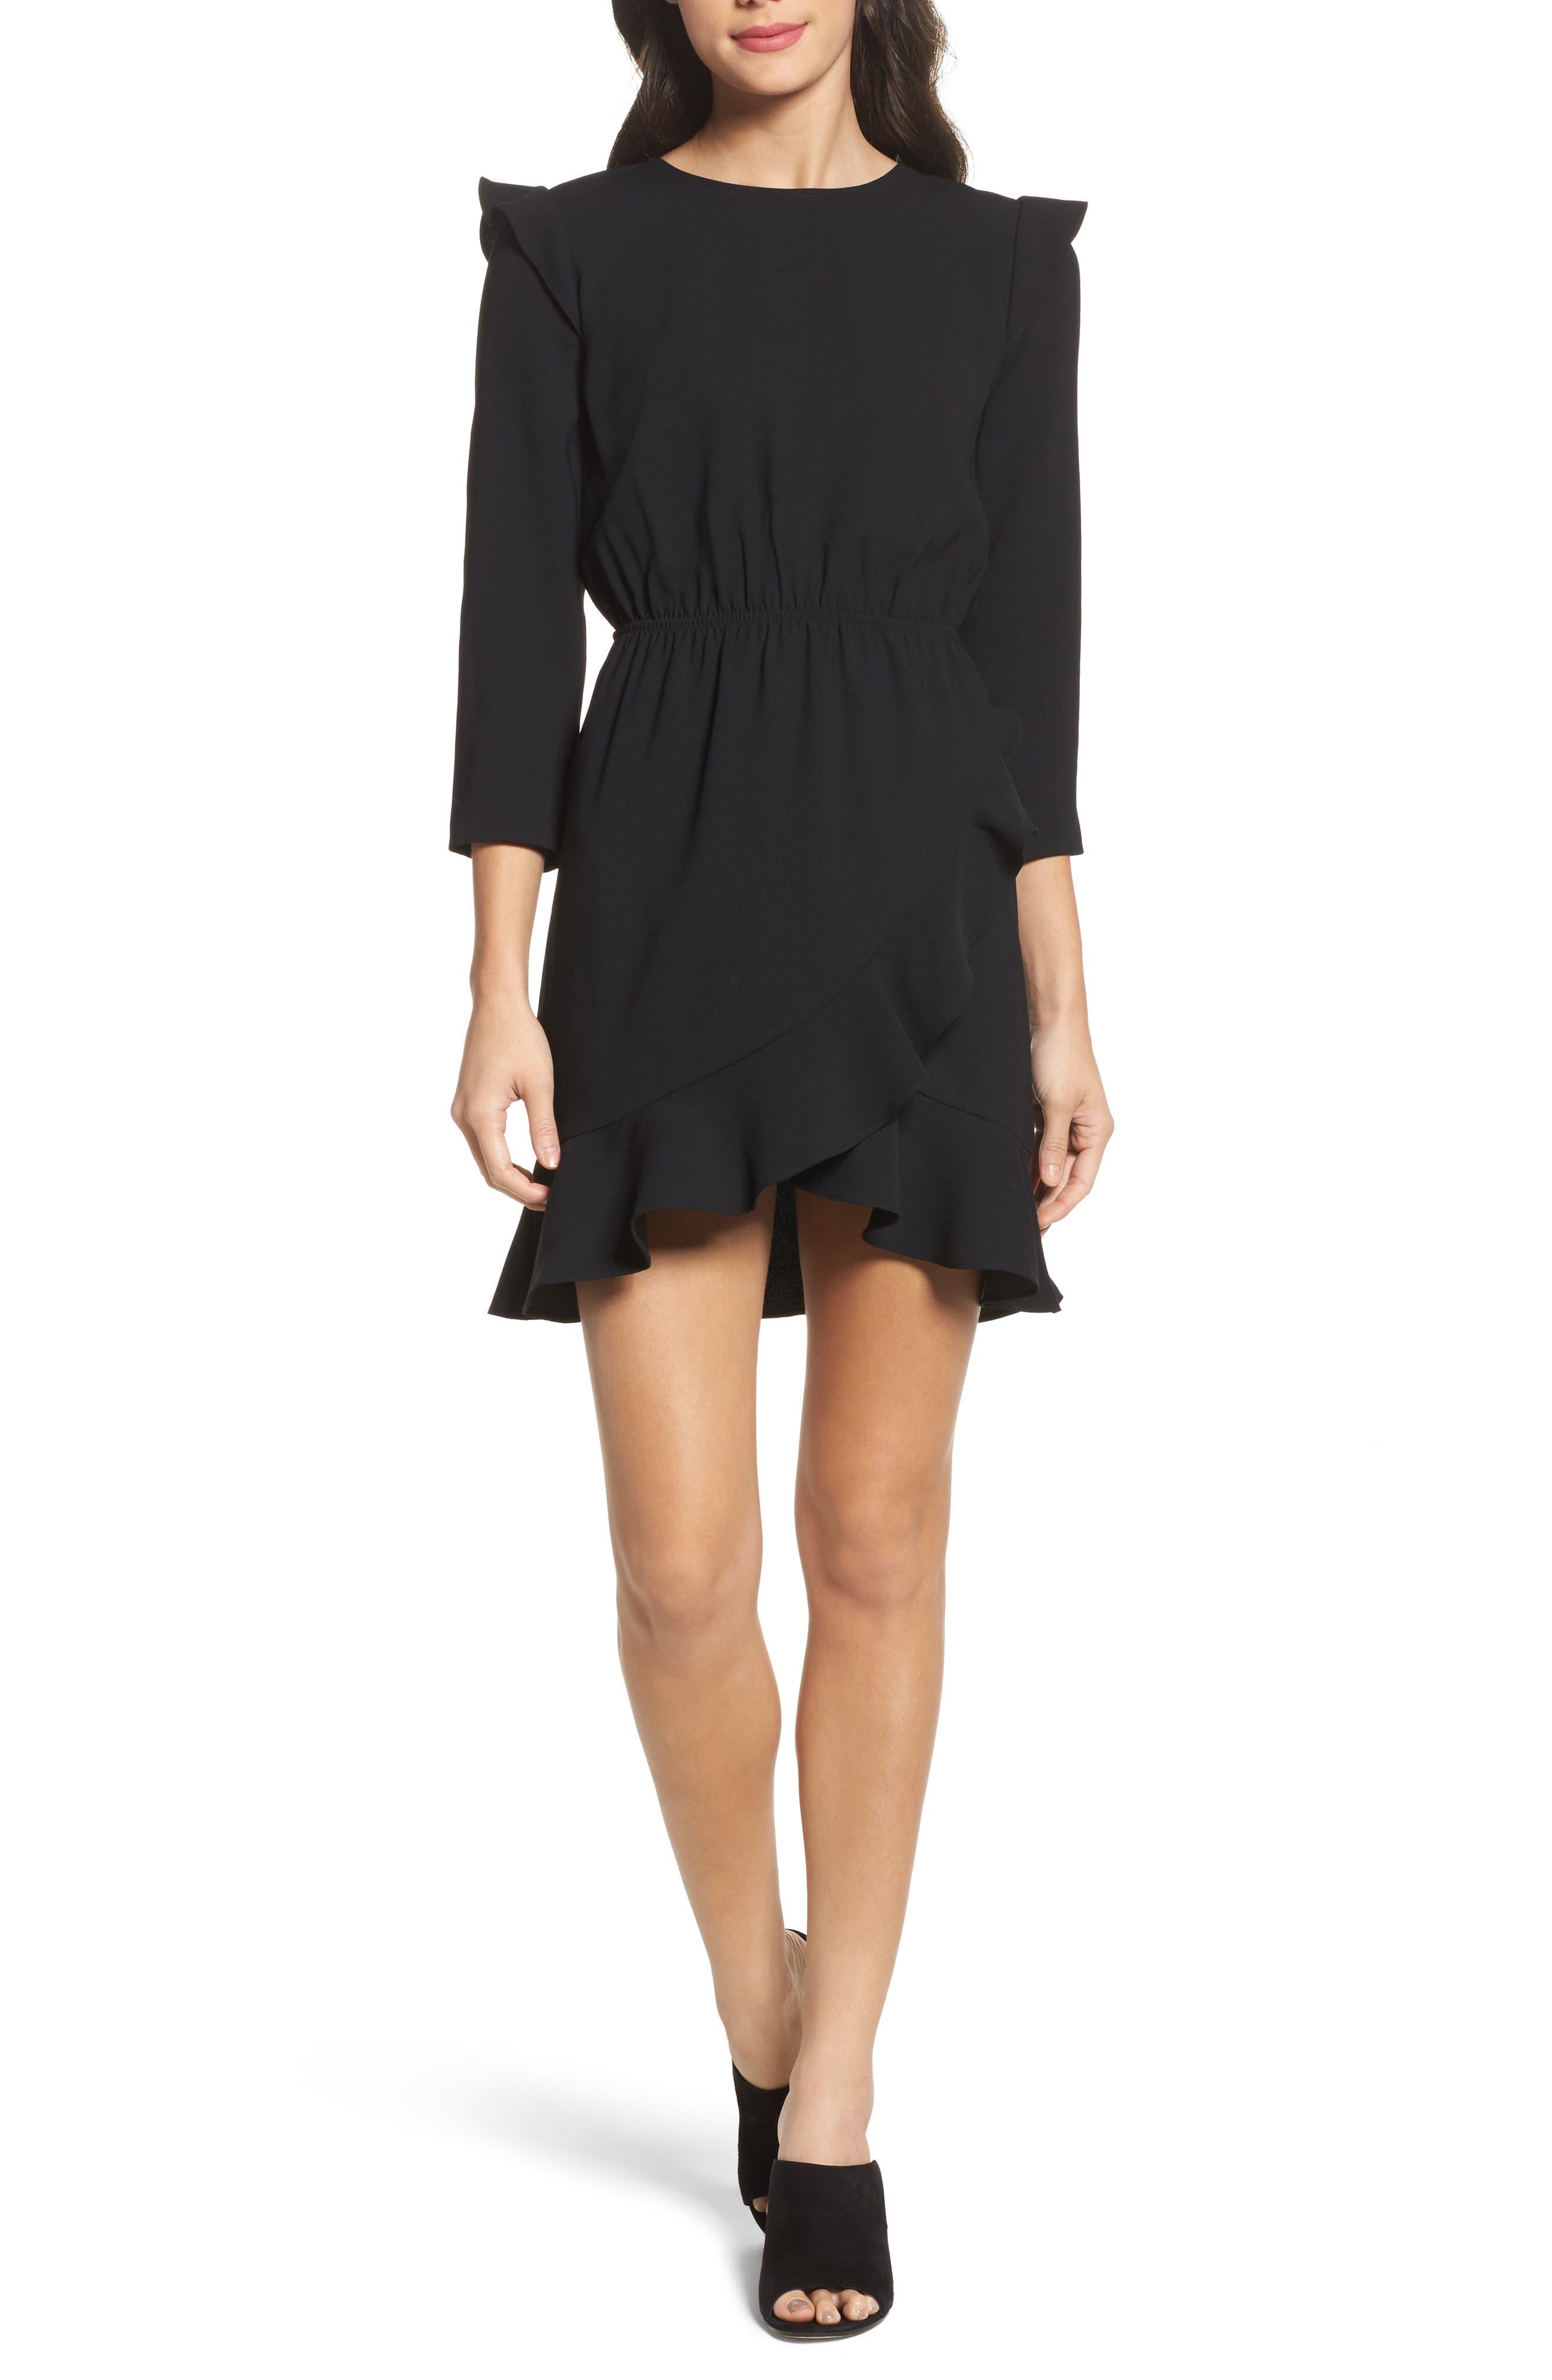 St Germain Ruffle Fit & Flare Dress,                         Main,                         color,